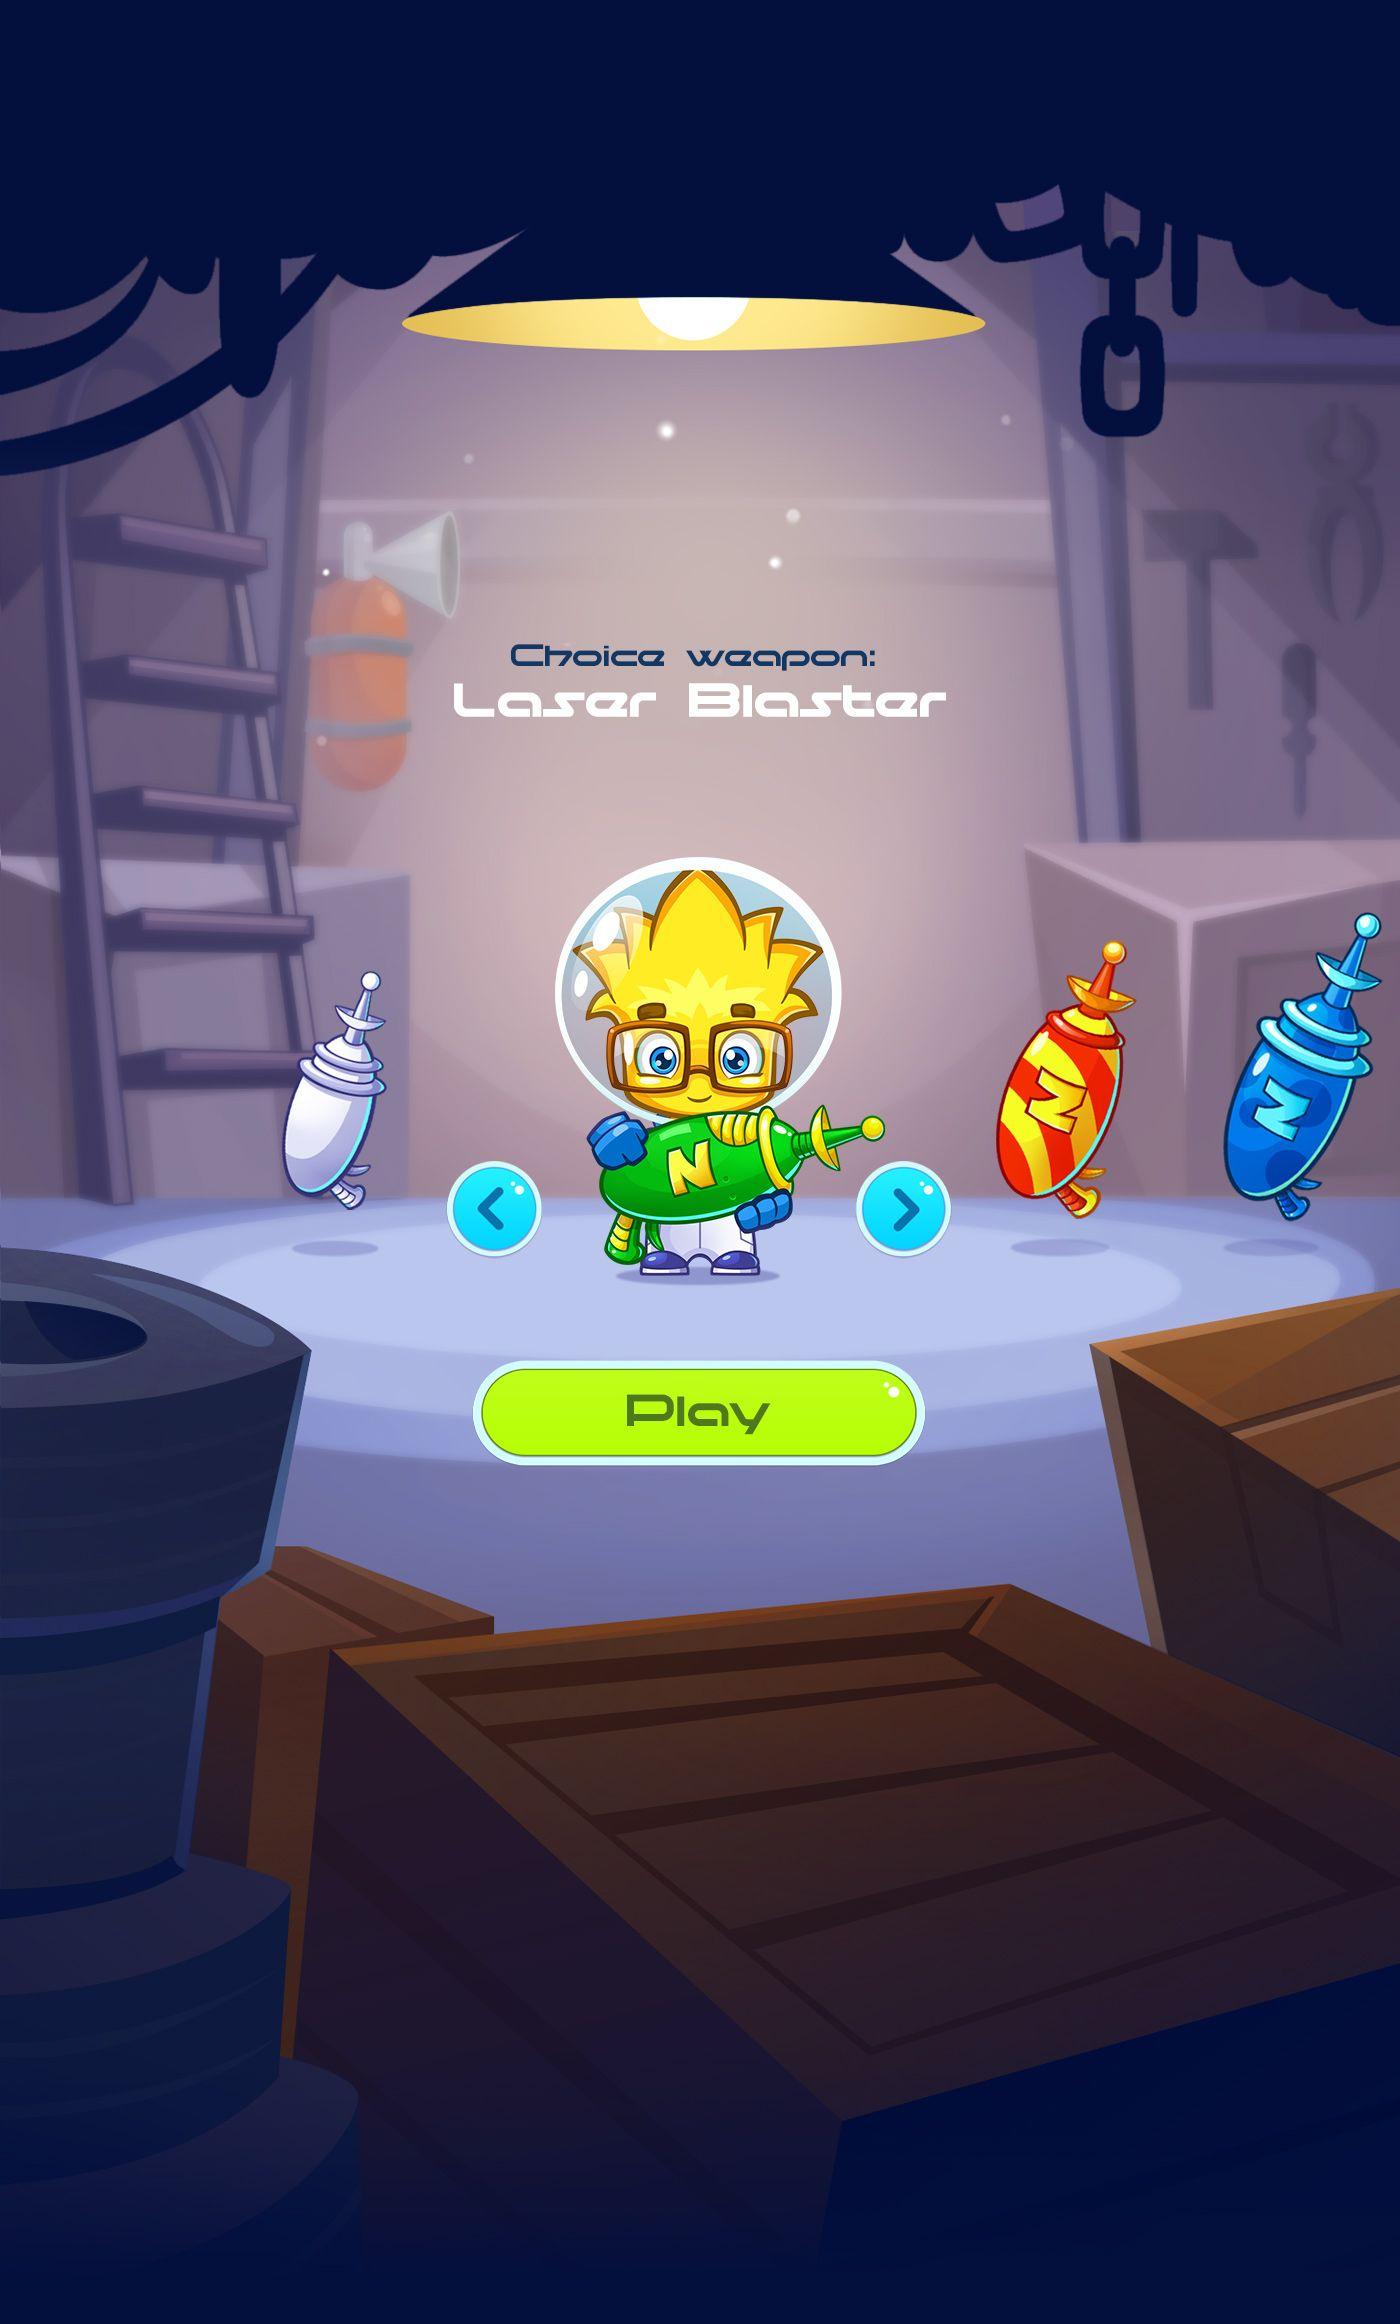 Character Design Ipad App : Beautiful game art educational game for kids ipad app for